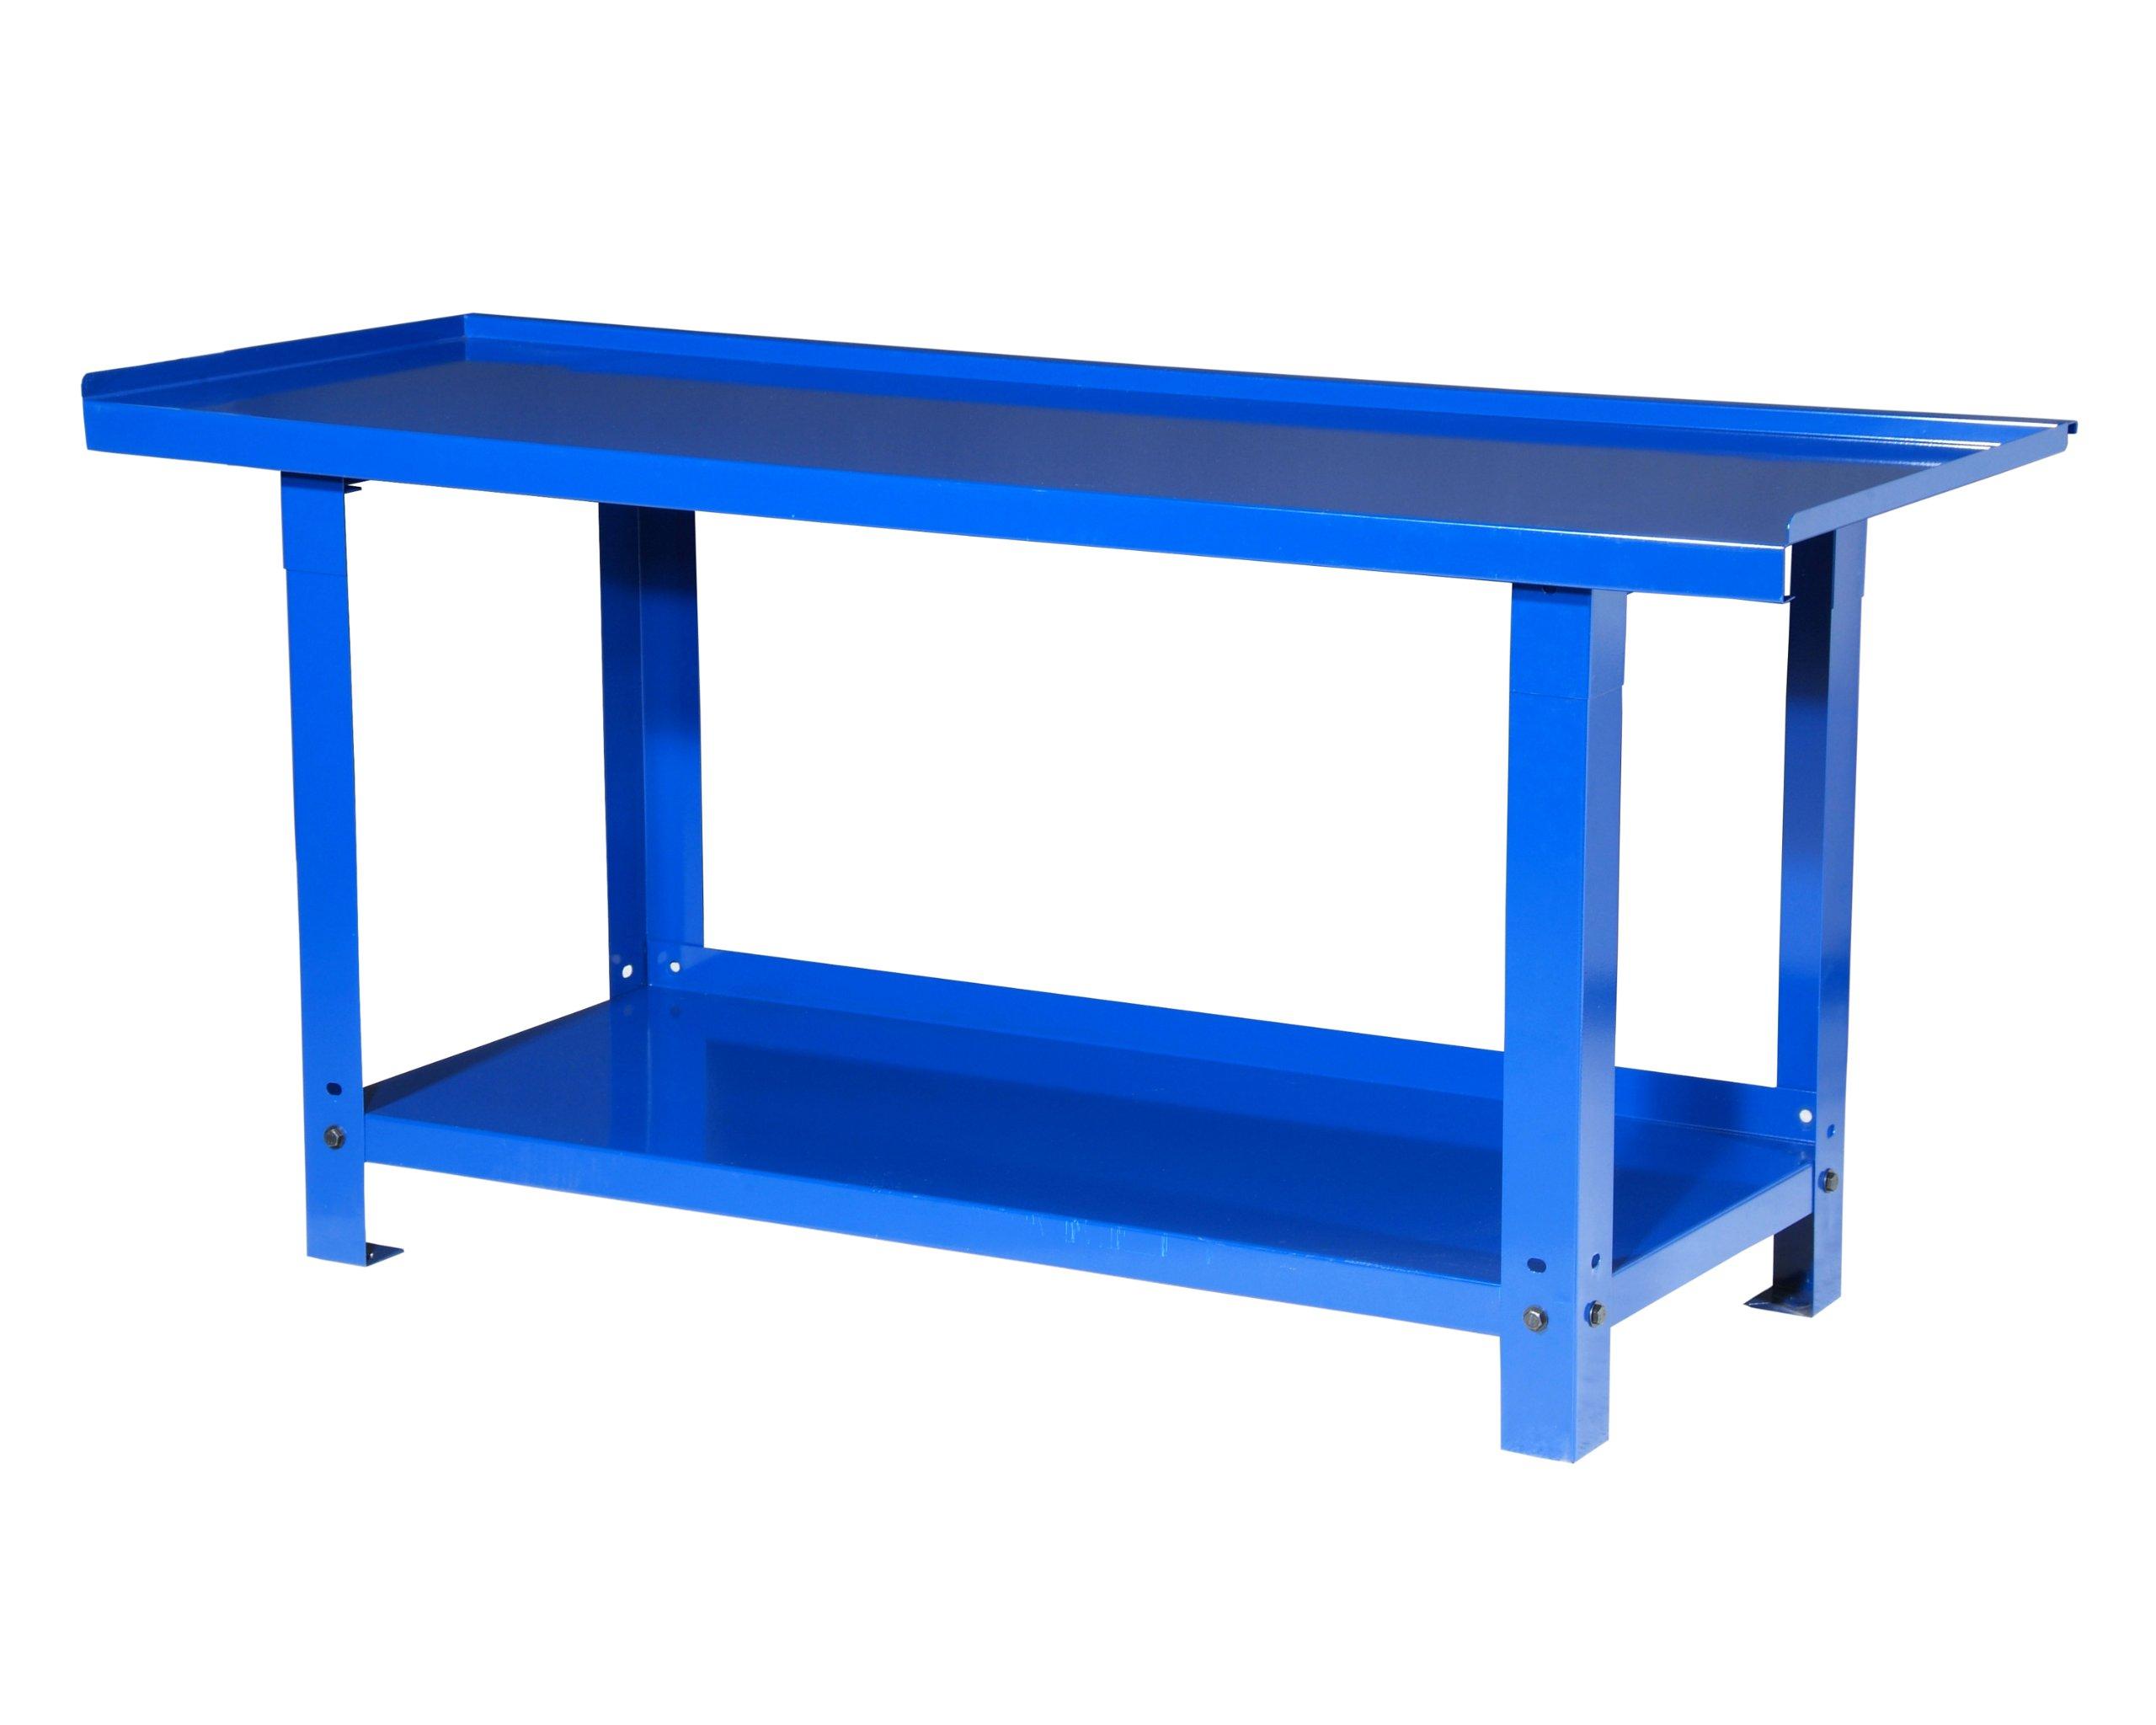 SPG-INTERNATIONAL LTEE METAL WORK BENCH - BLUE